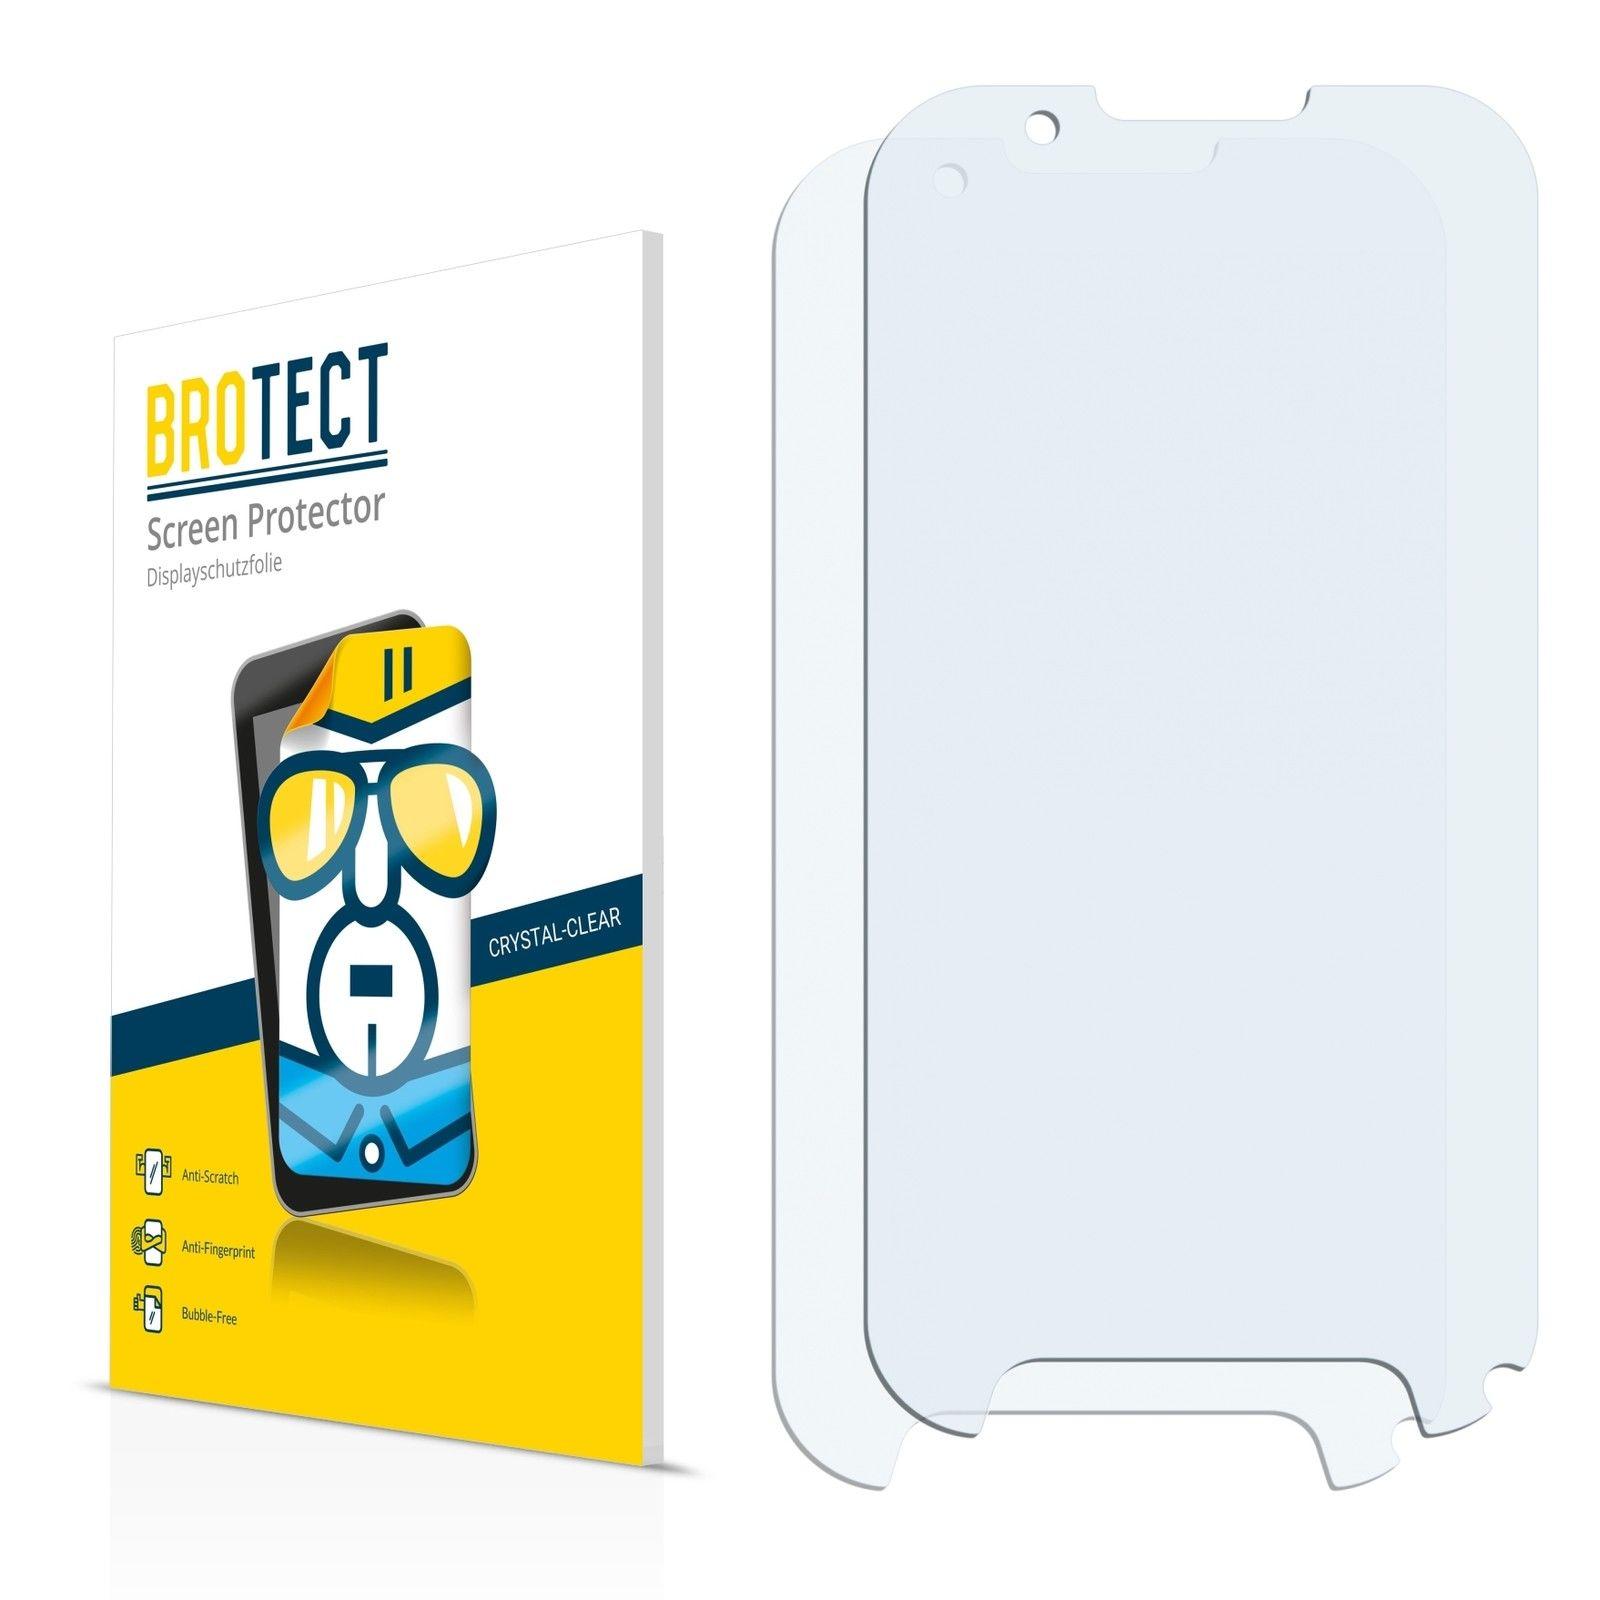 2 ks Ochranná fólie Brotec HD na LCD pro Evolveo StrongPhone D2